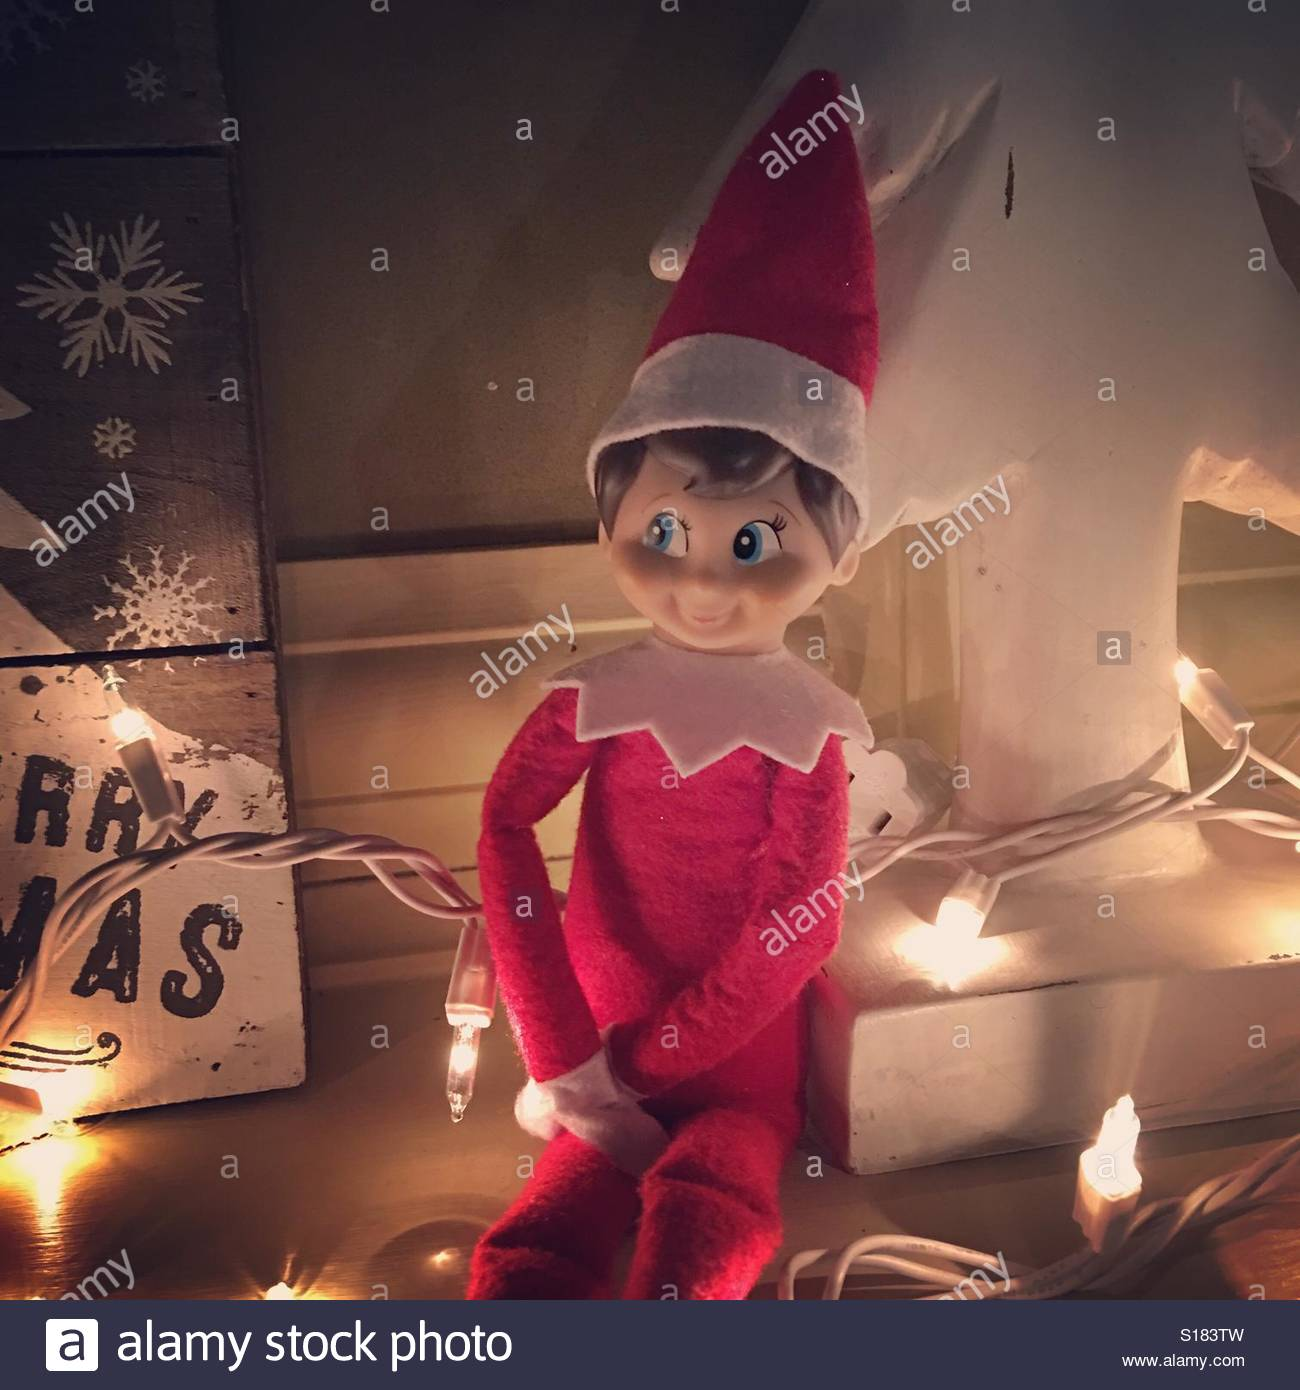 Elf on the shelf Stock Photo